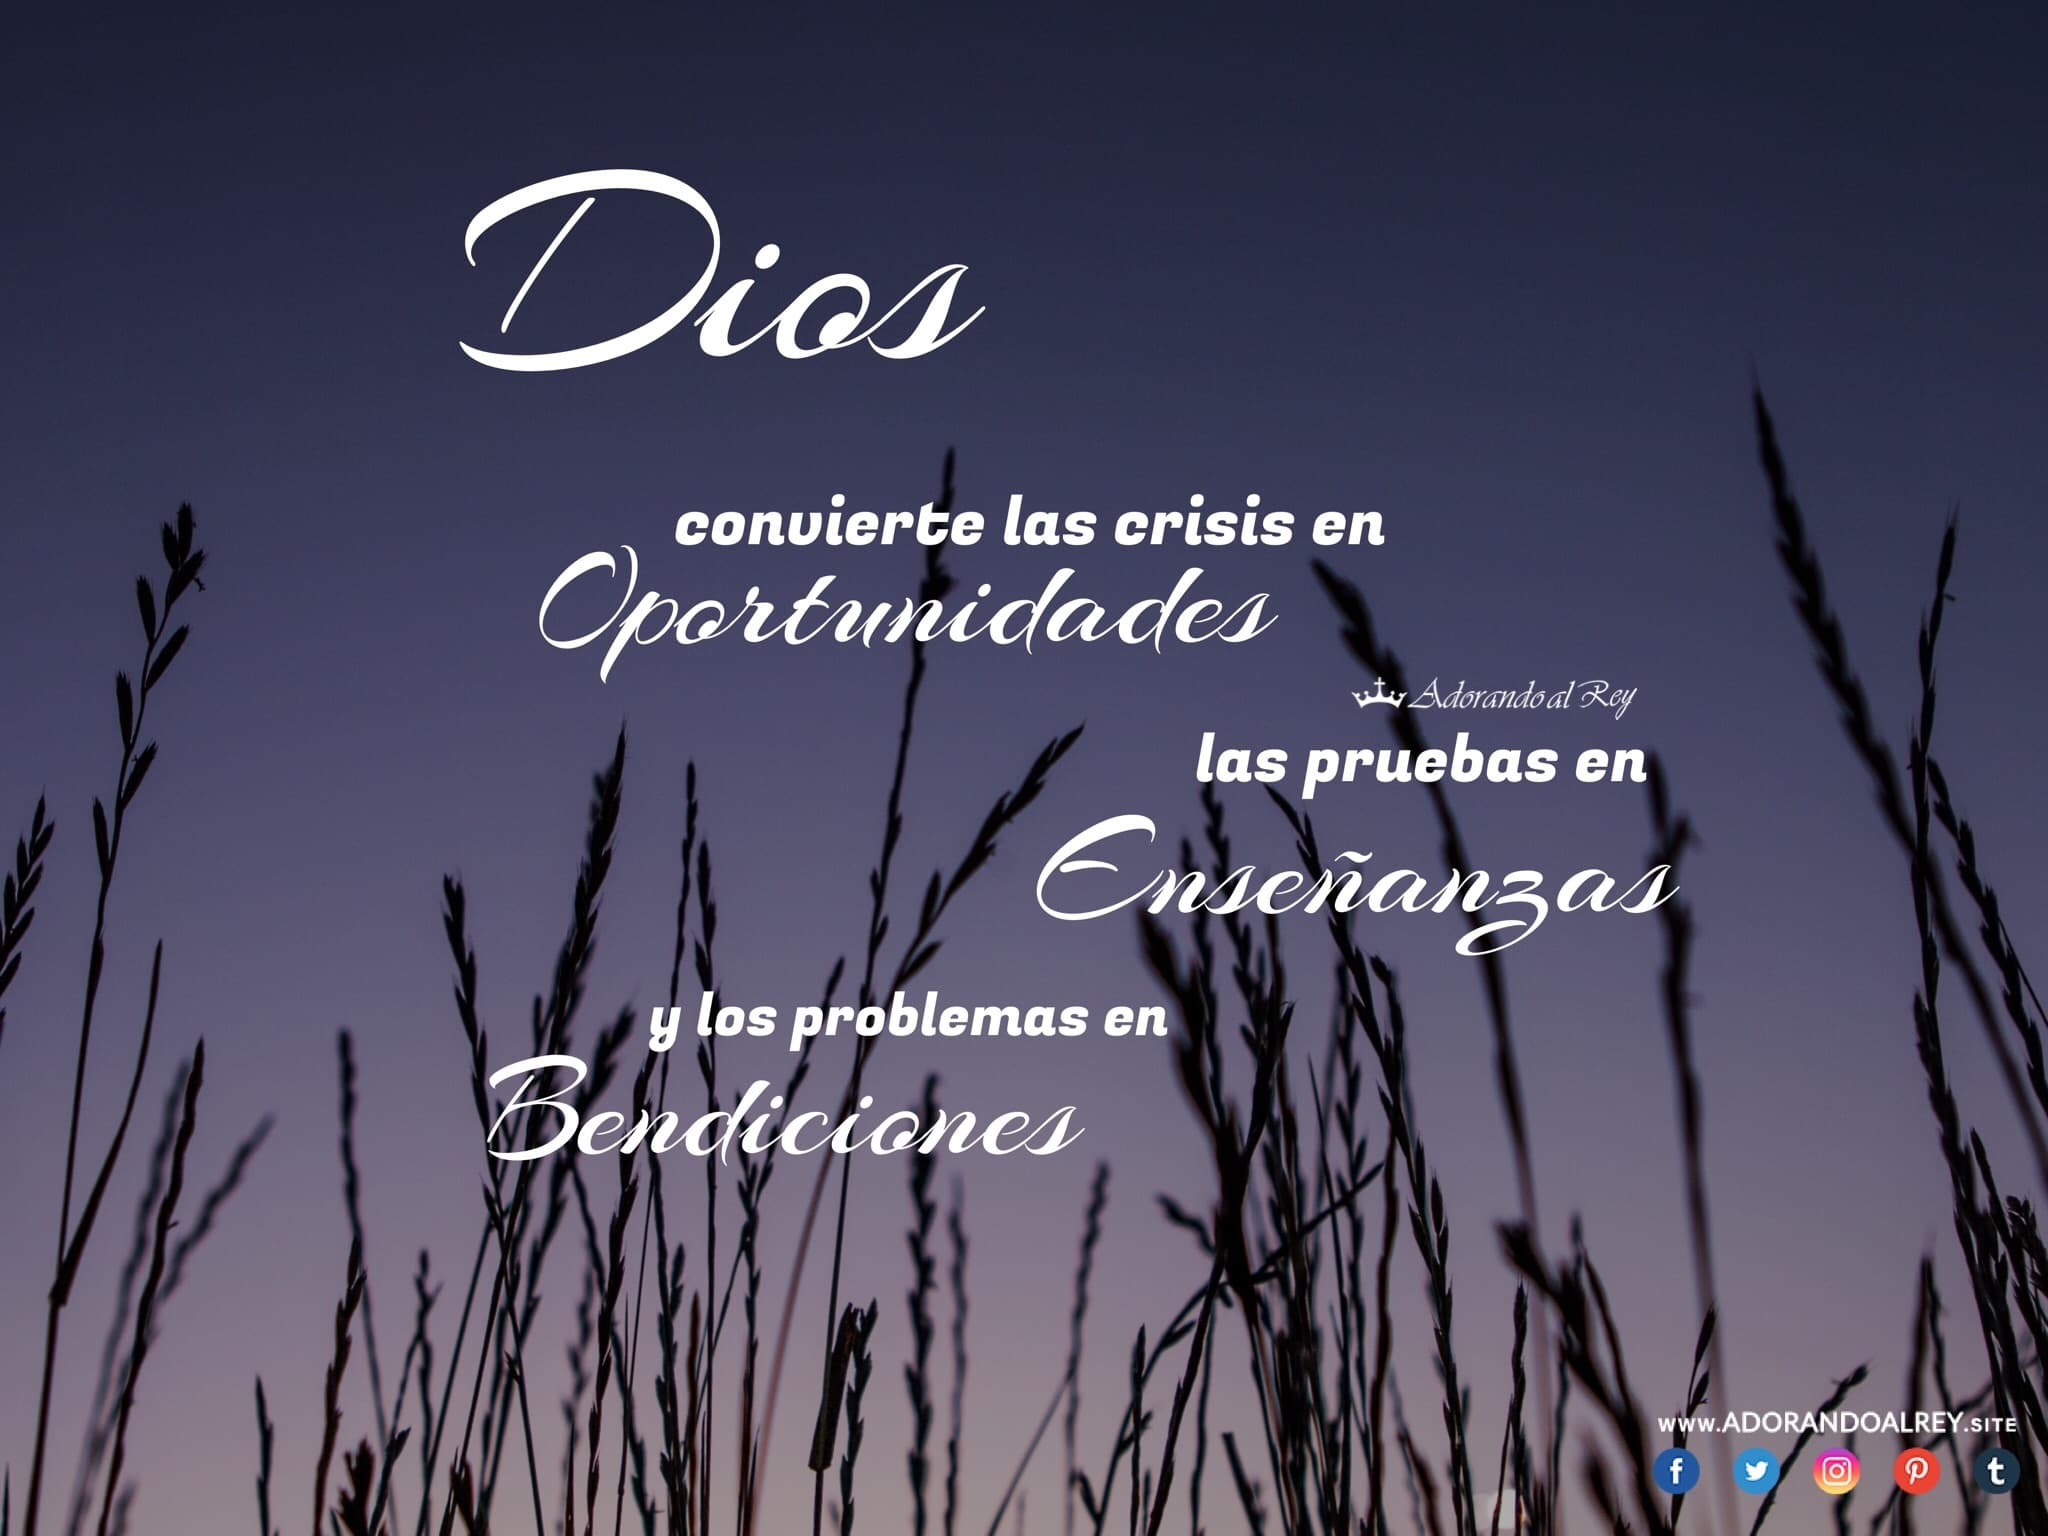 Dios convierte